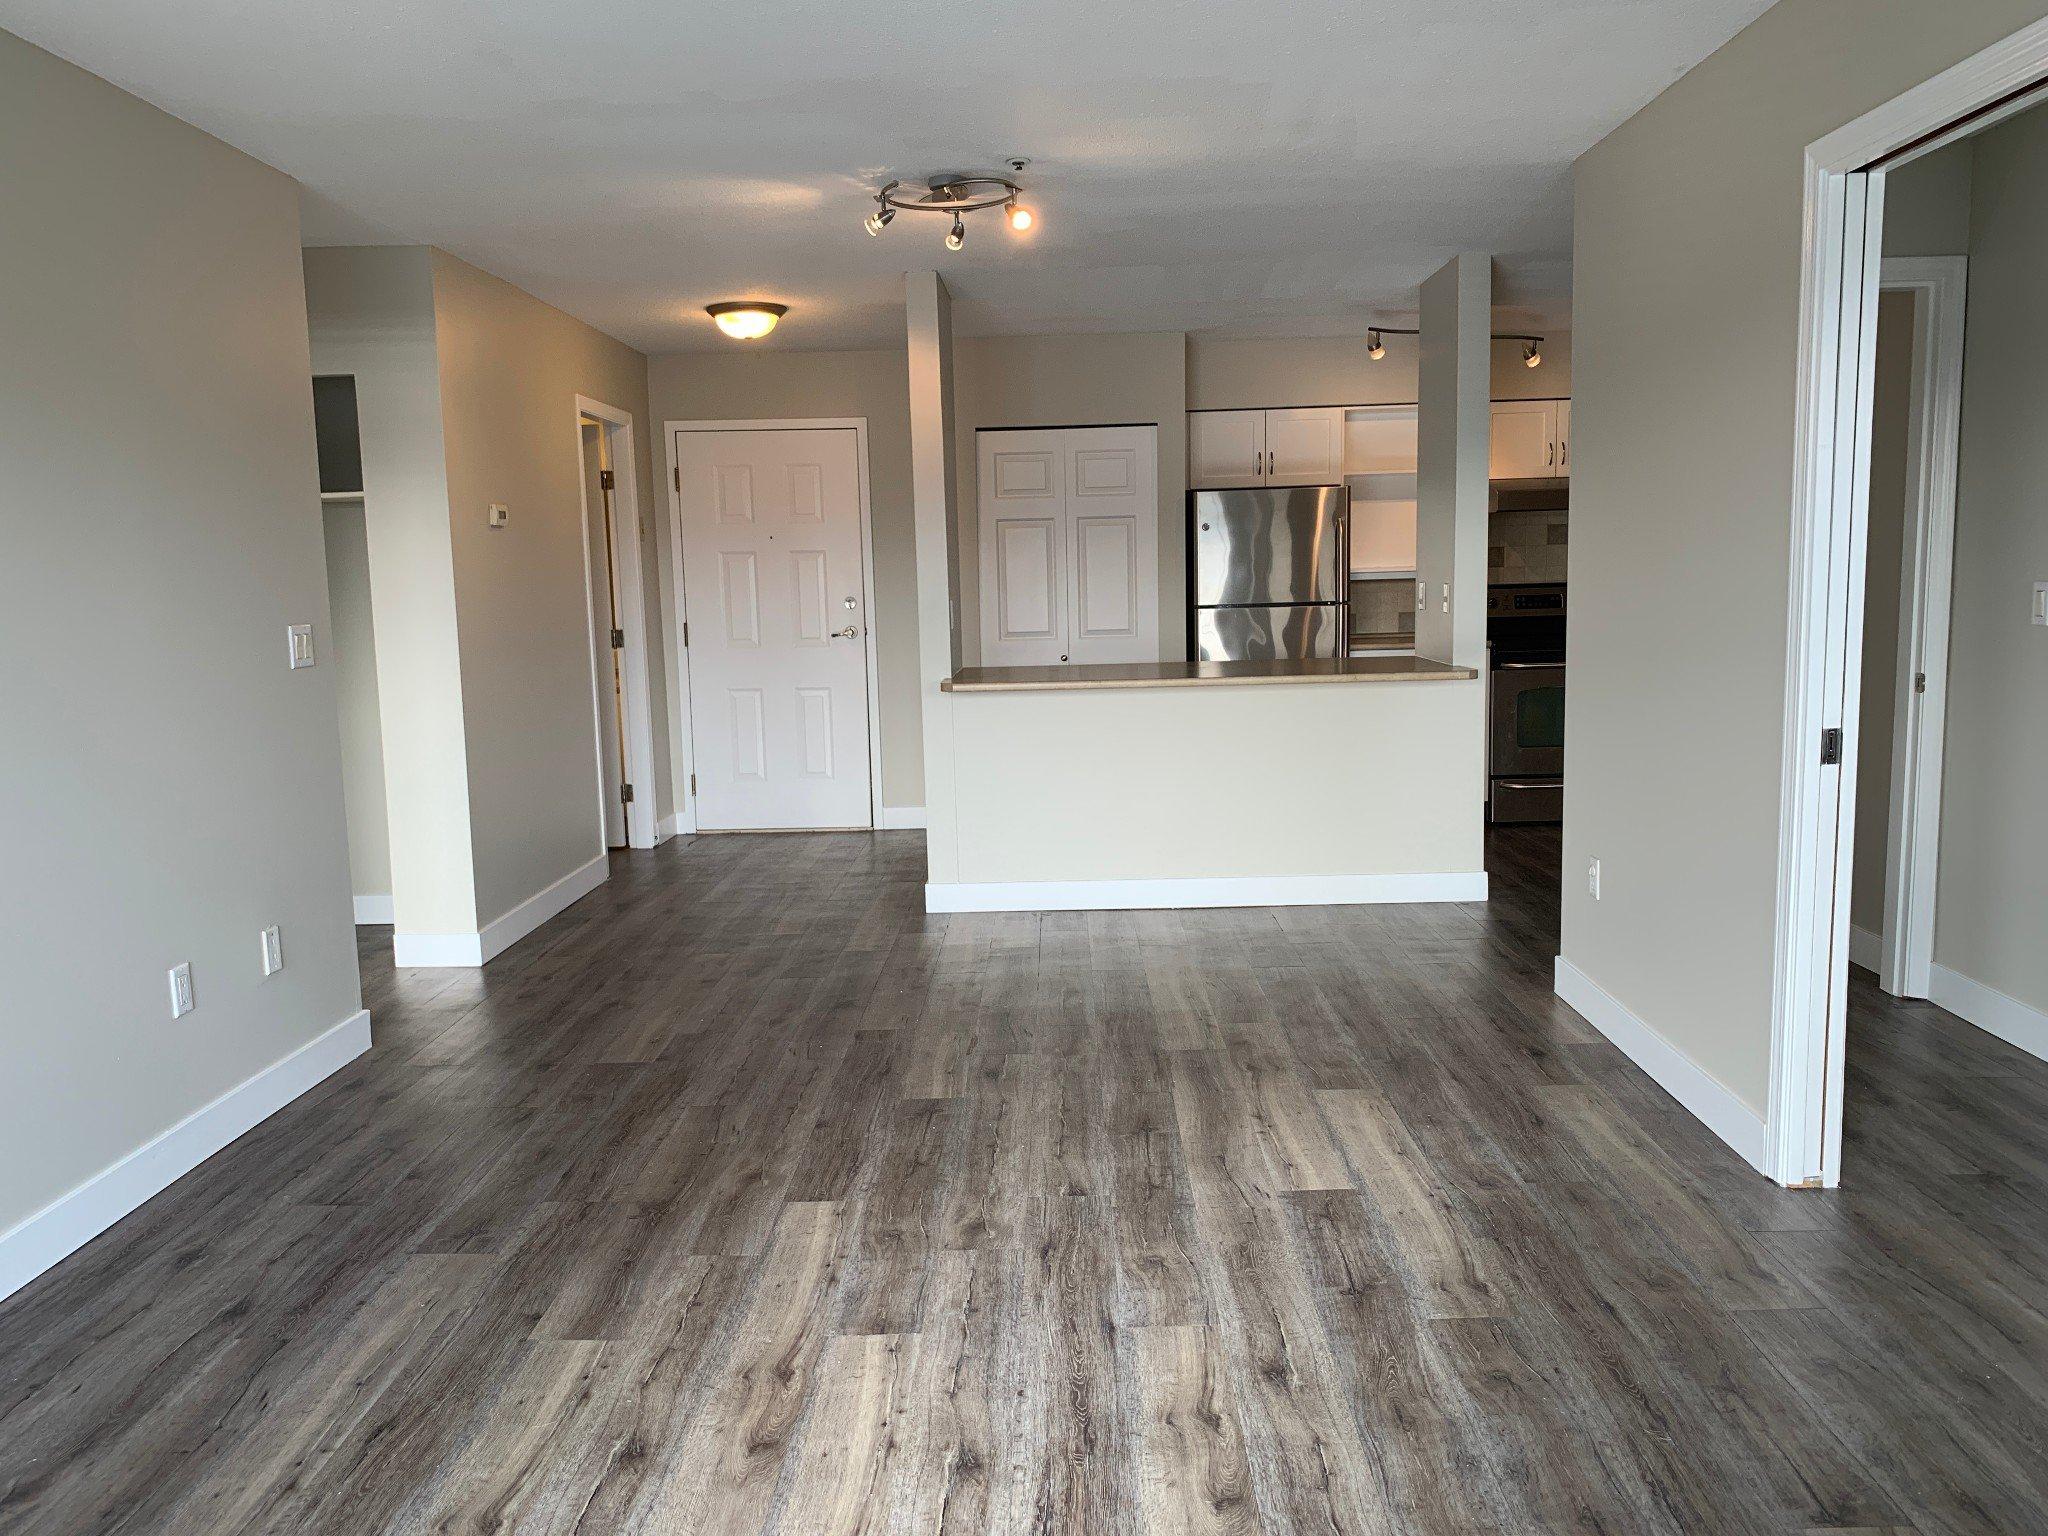 Photo 5: Photos: #510 2700 McCallum Rd. in Abbotsford: Central Abbotsford Condo for rent